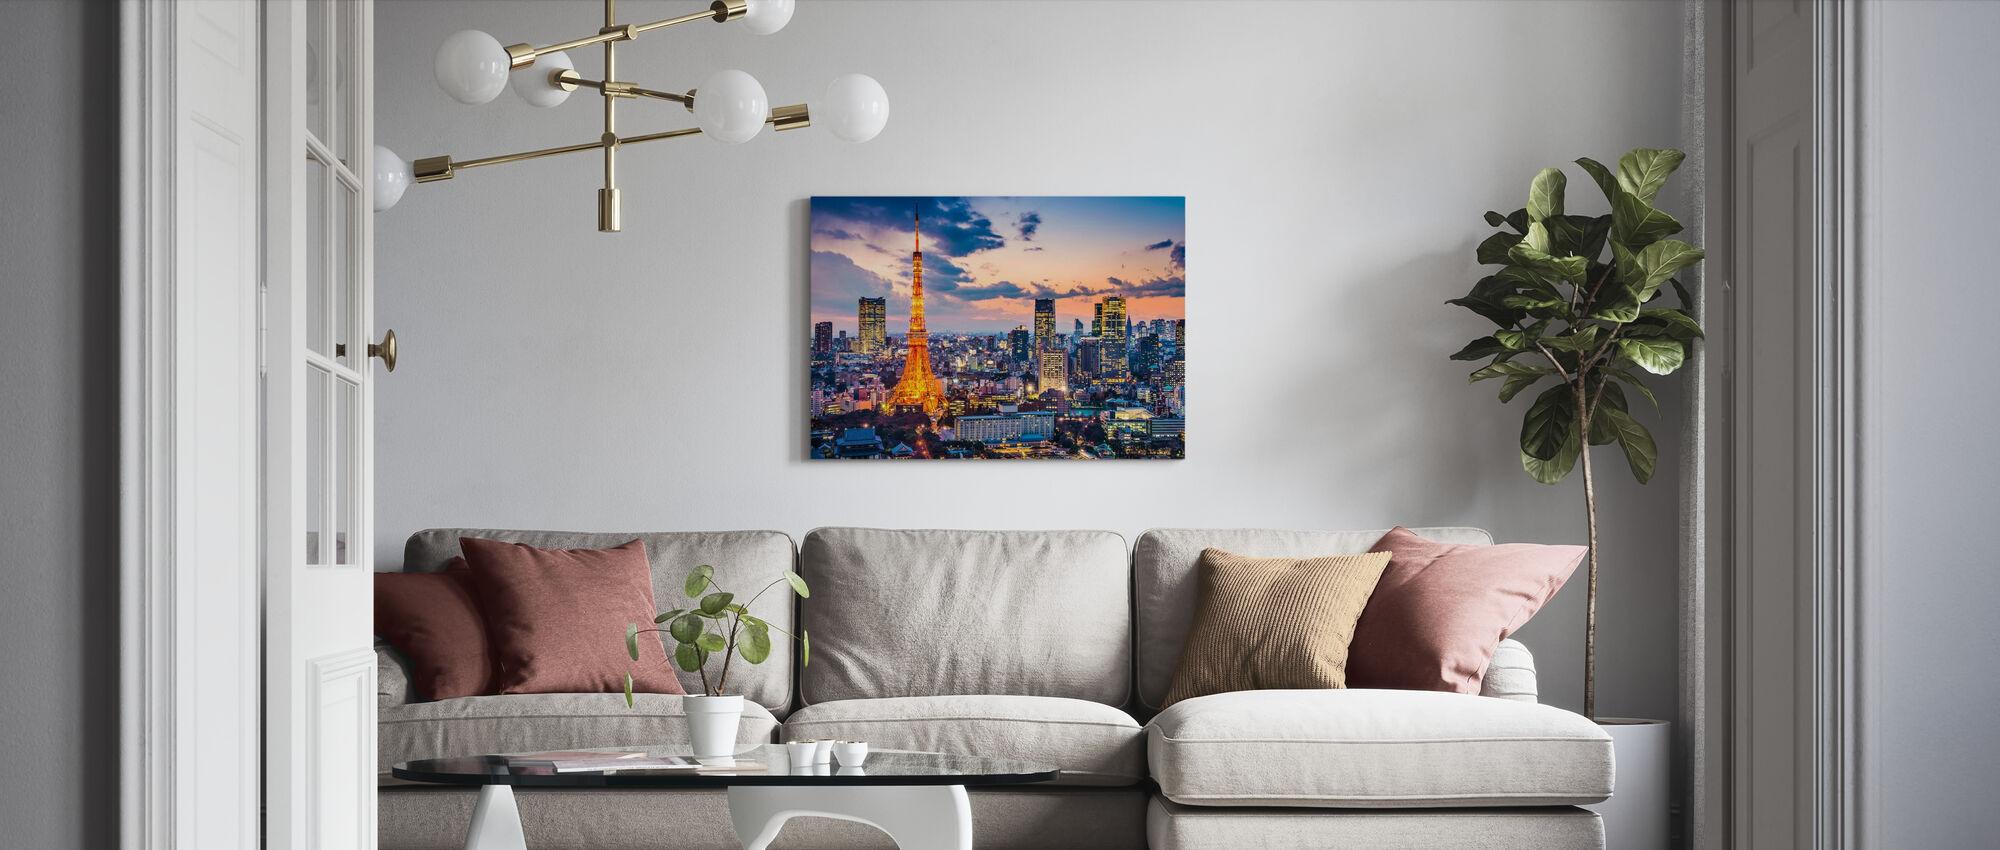 Tokyo Lights - Canvas print - Living Room